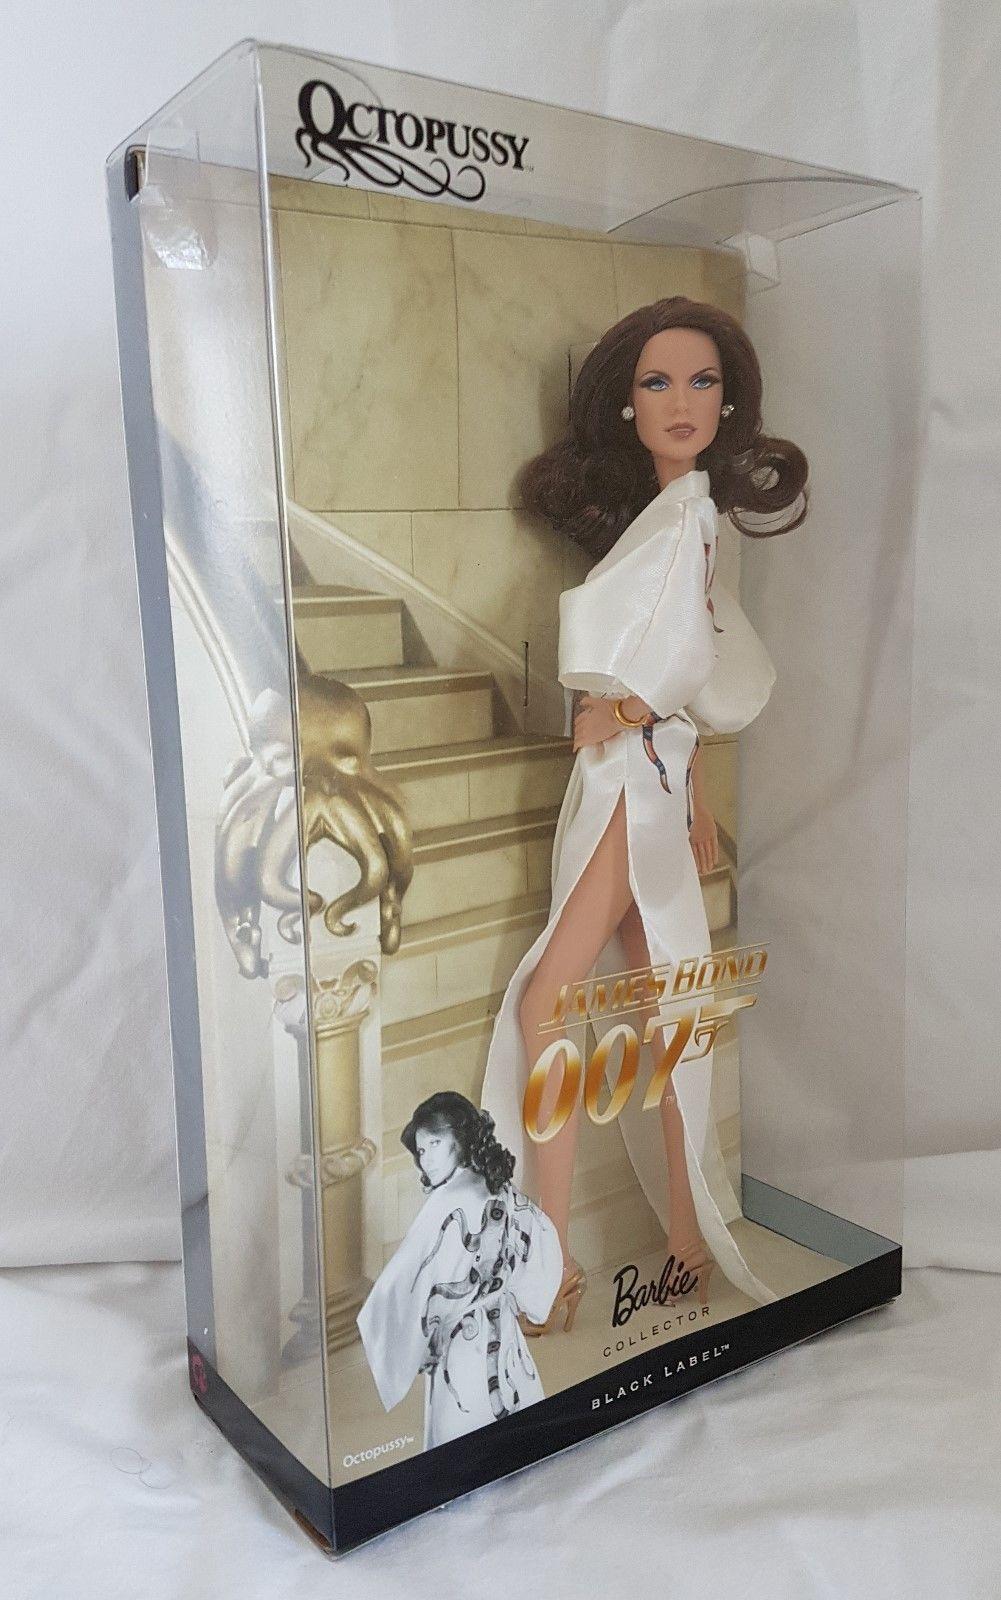 James Bond 007 Octopussy Barbie Black Label Edition Ebay